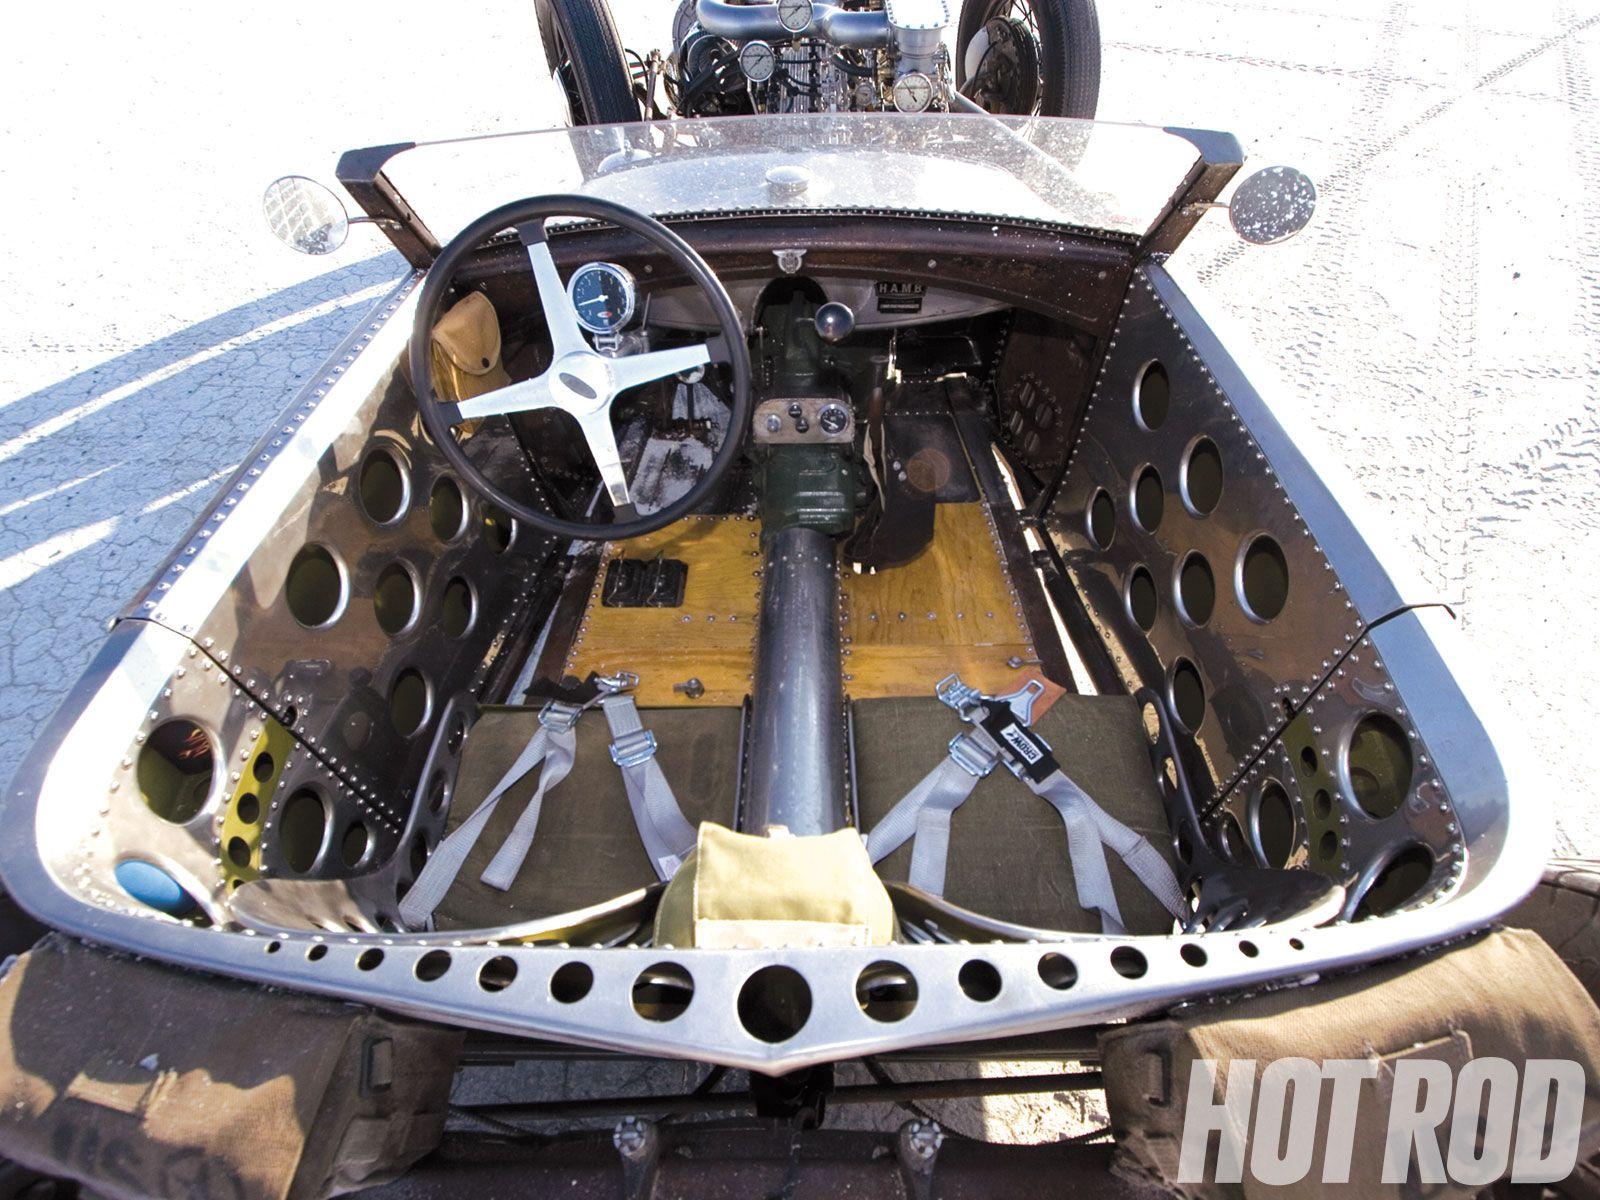 Car amp bike fanatics suzuki m50 bobber bike - Interior Holy Sheets Of Metal Batman This Is 1 Of Robins Favorite Designs